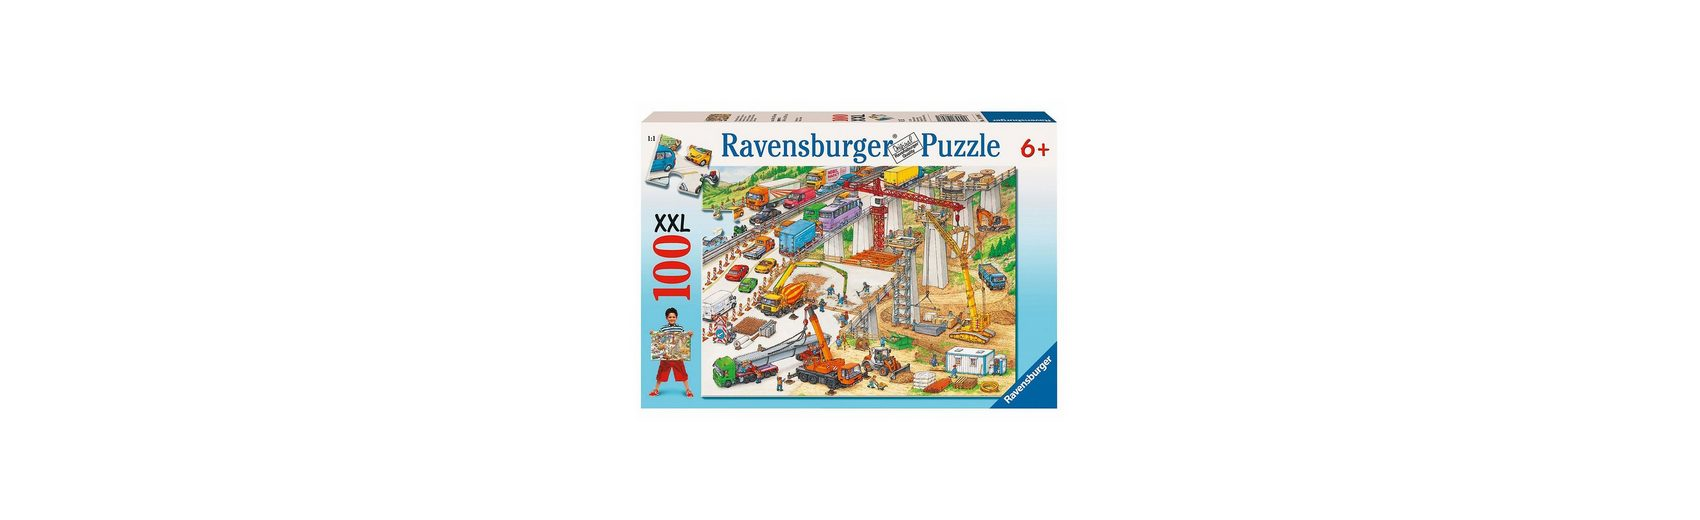 Ravensburger Puzzle XXL 100 Teile Riesige Baustelle